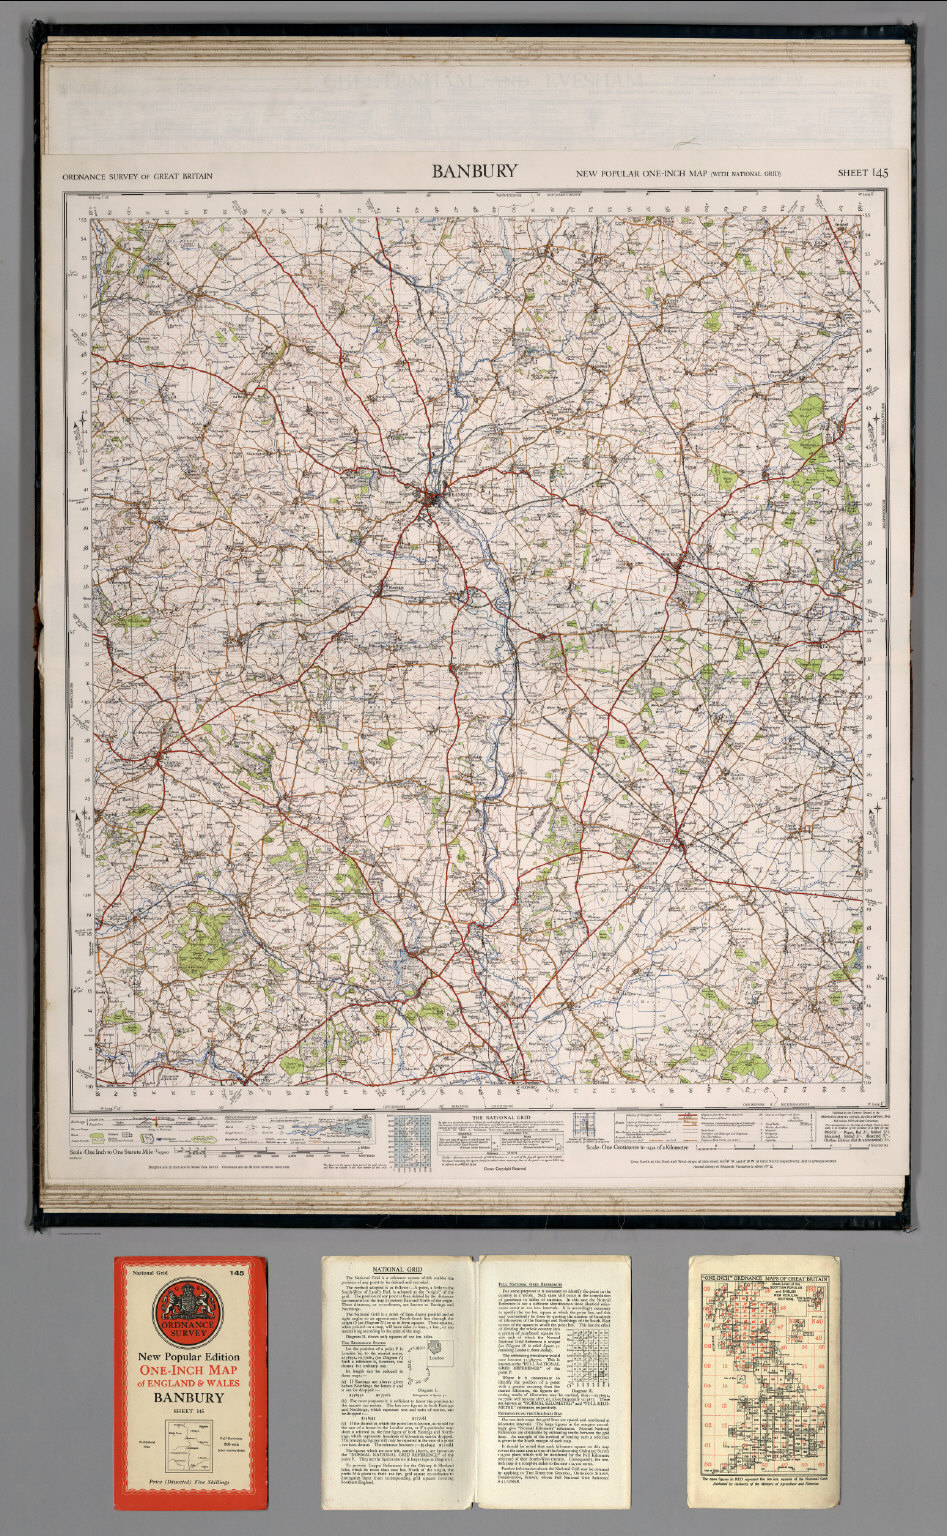 Banbury England Map.Sheet 145 Banbury David Rumsey Historical Map Collection